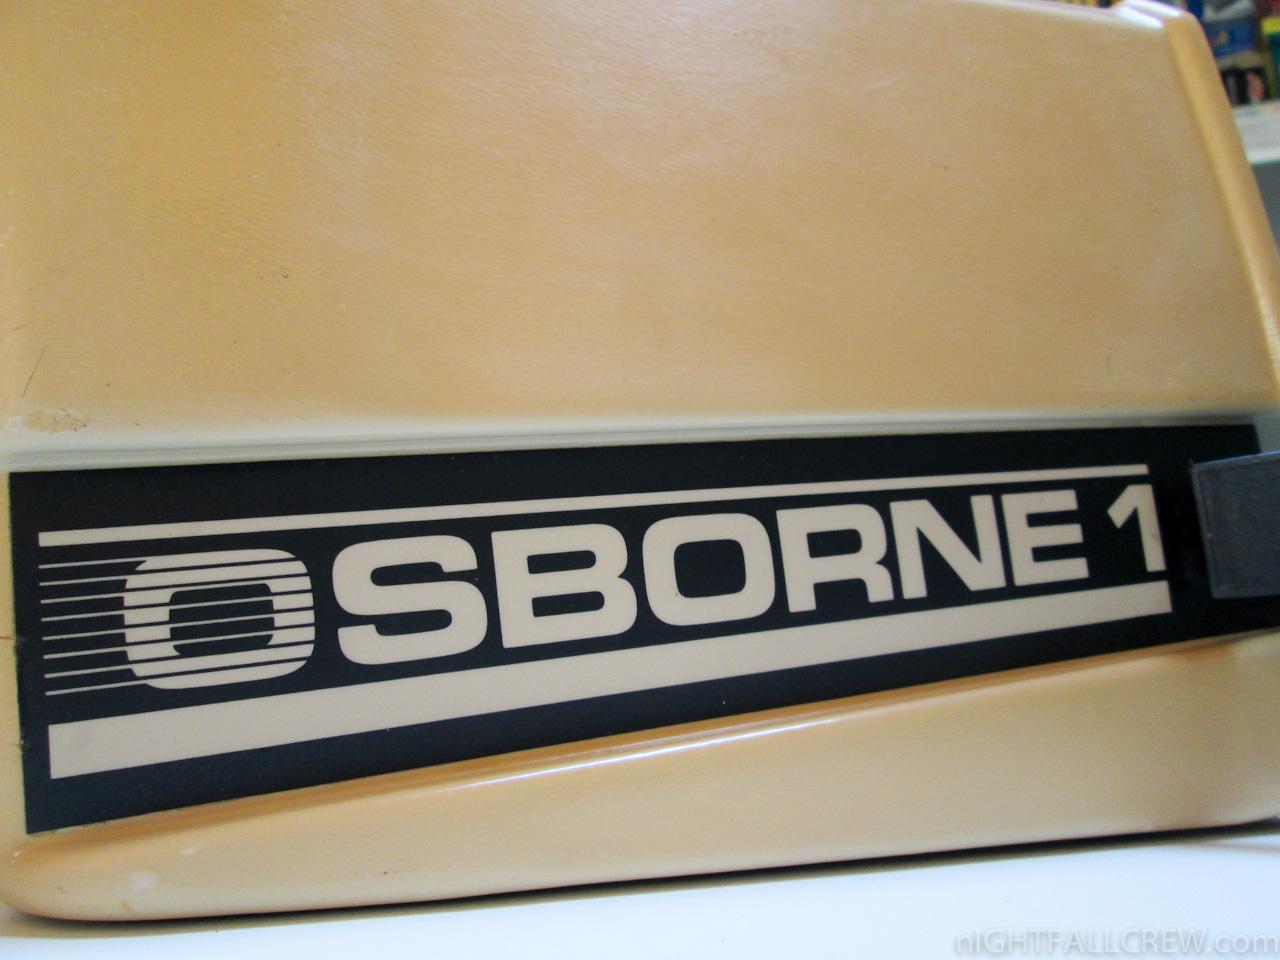 технологии второй половины 20 века: Osborne 1